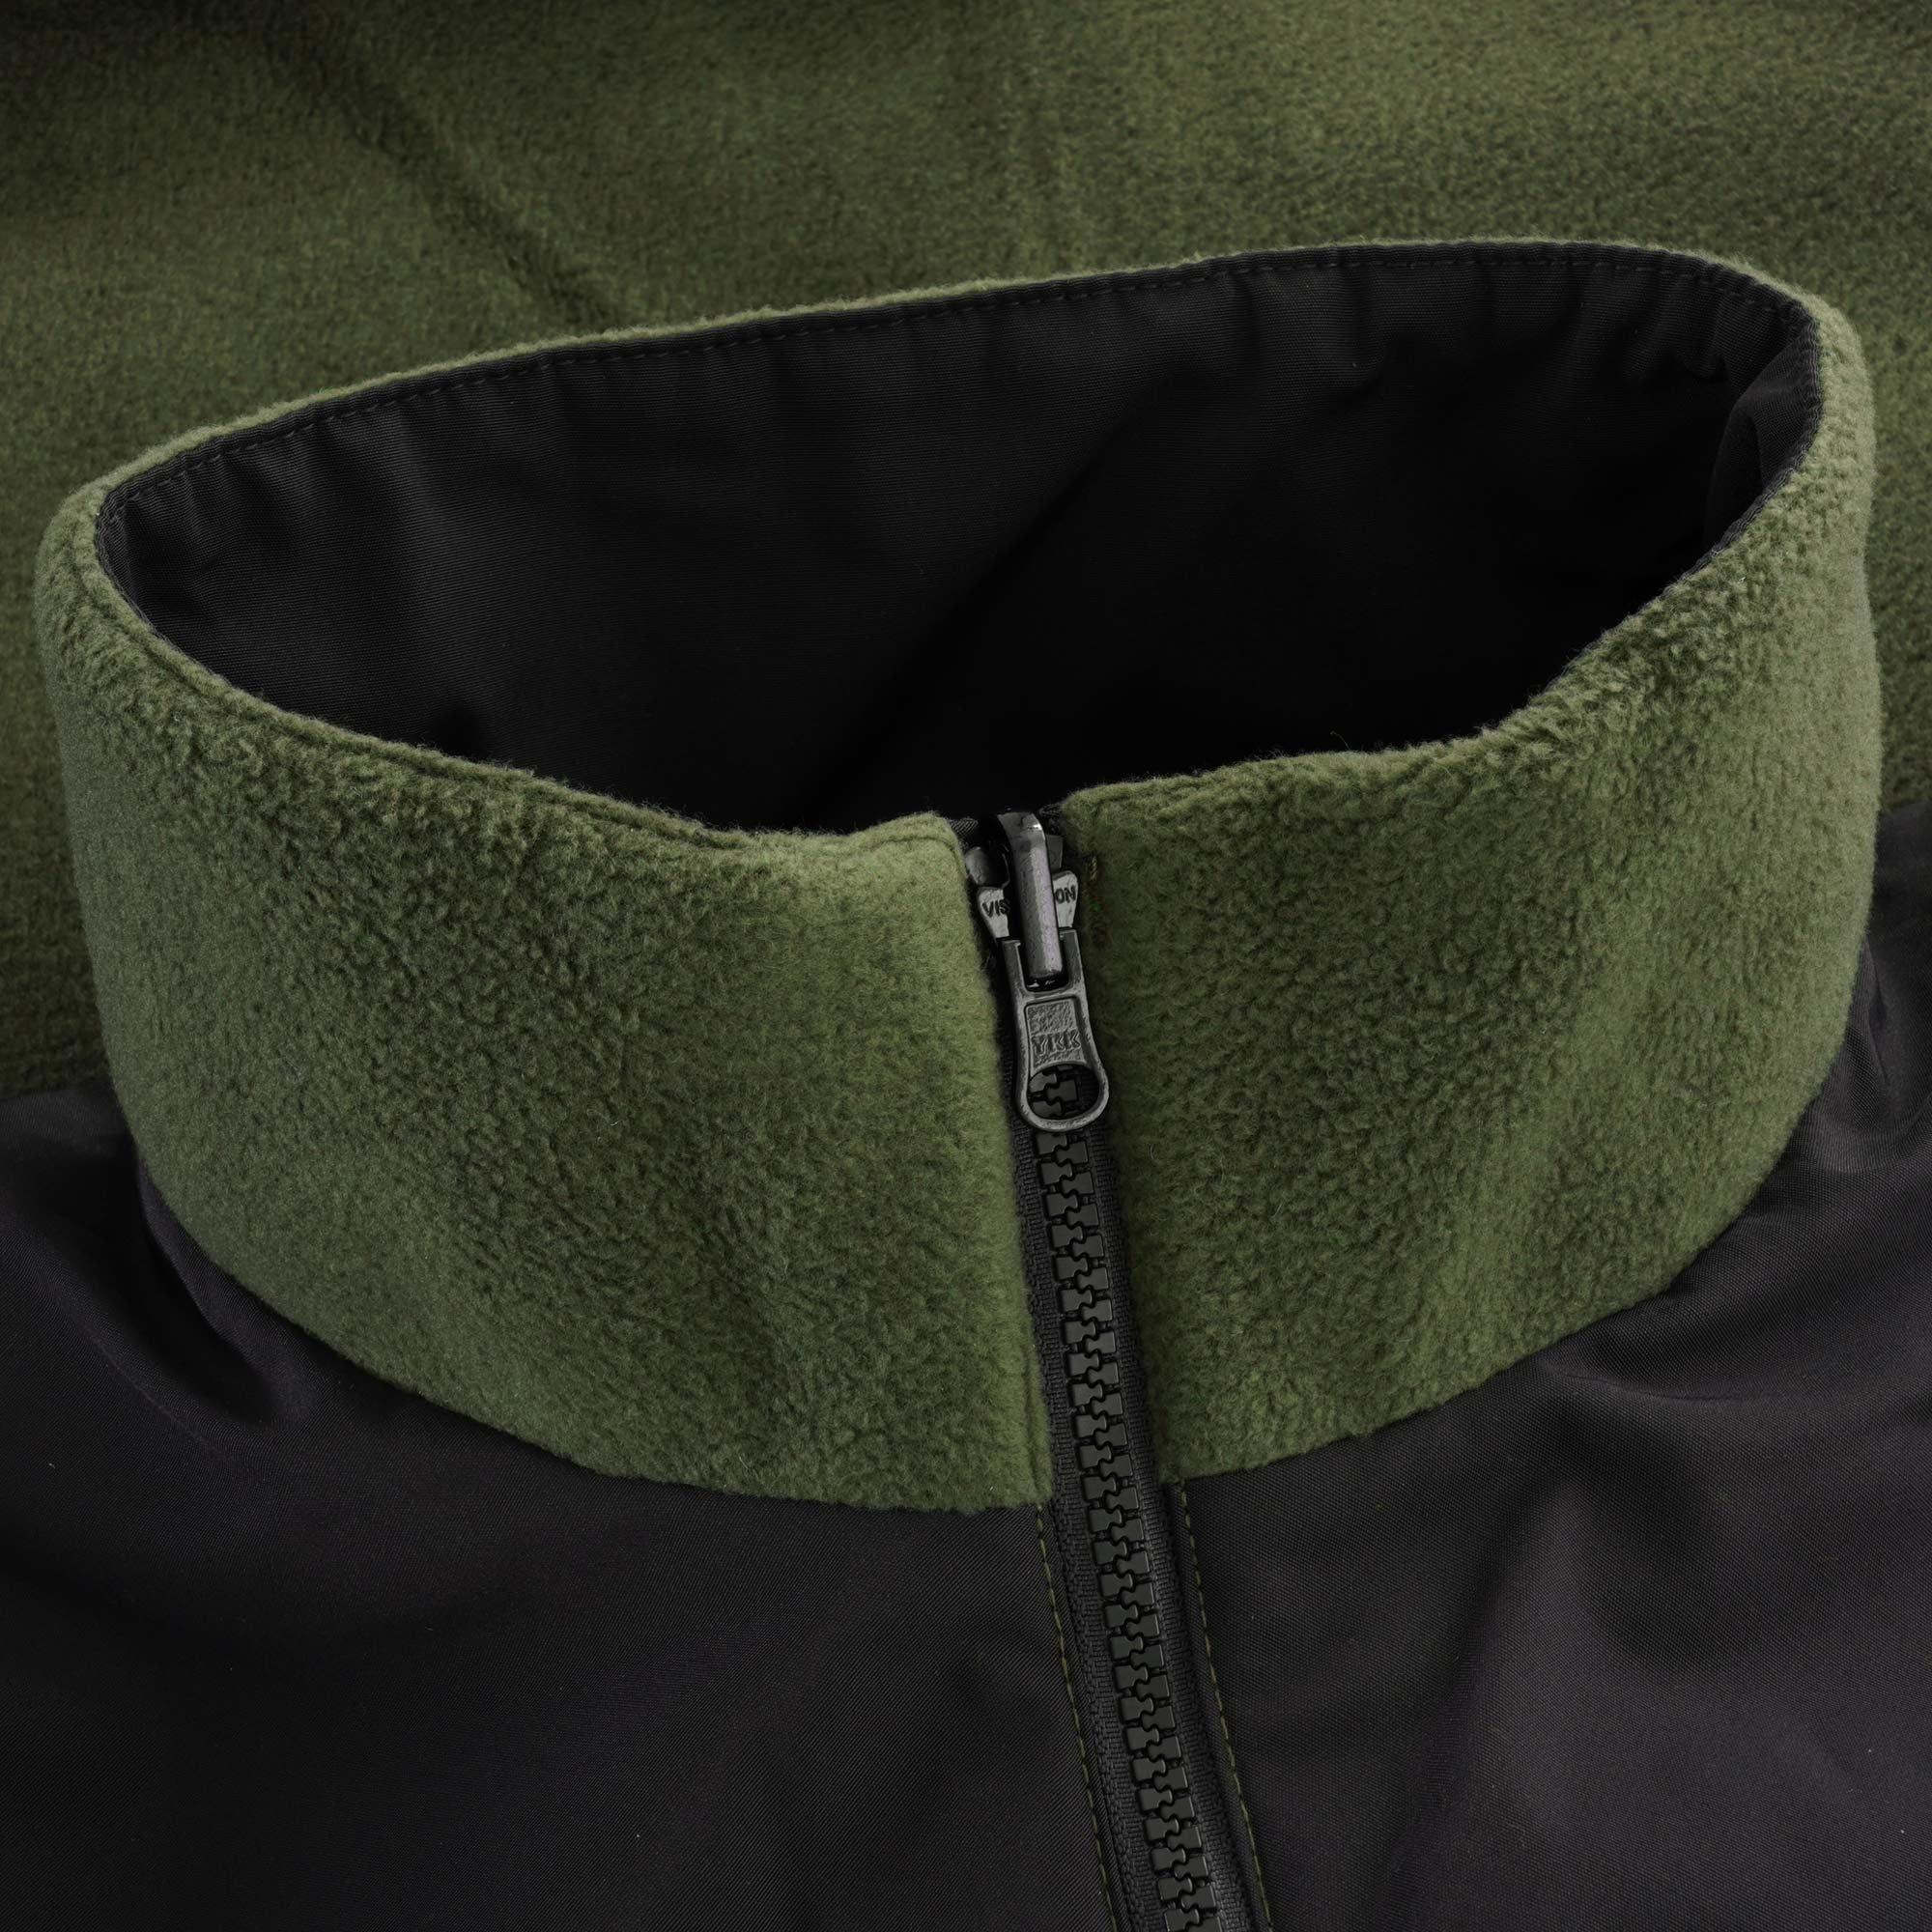 Carhartt Denby Reversible Jacket Black Cypress JANUARY SALE!